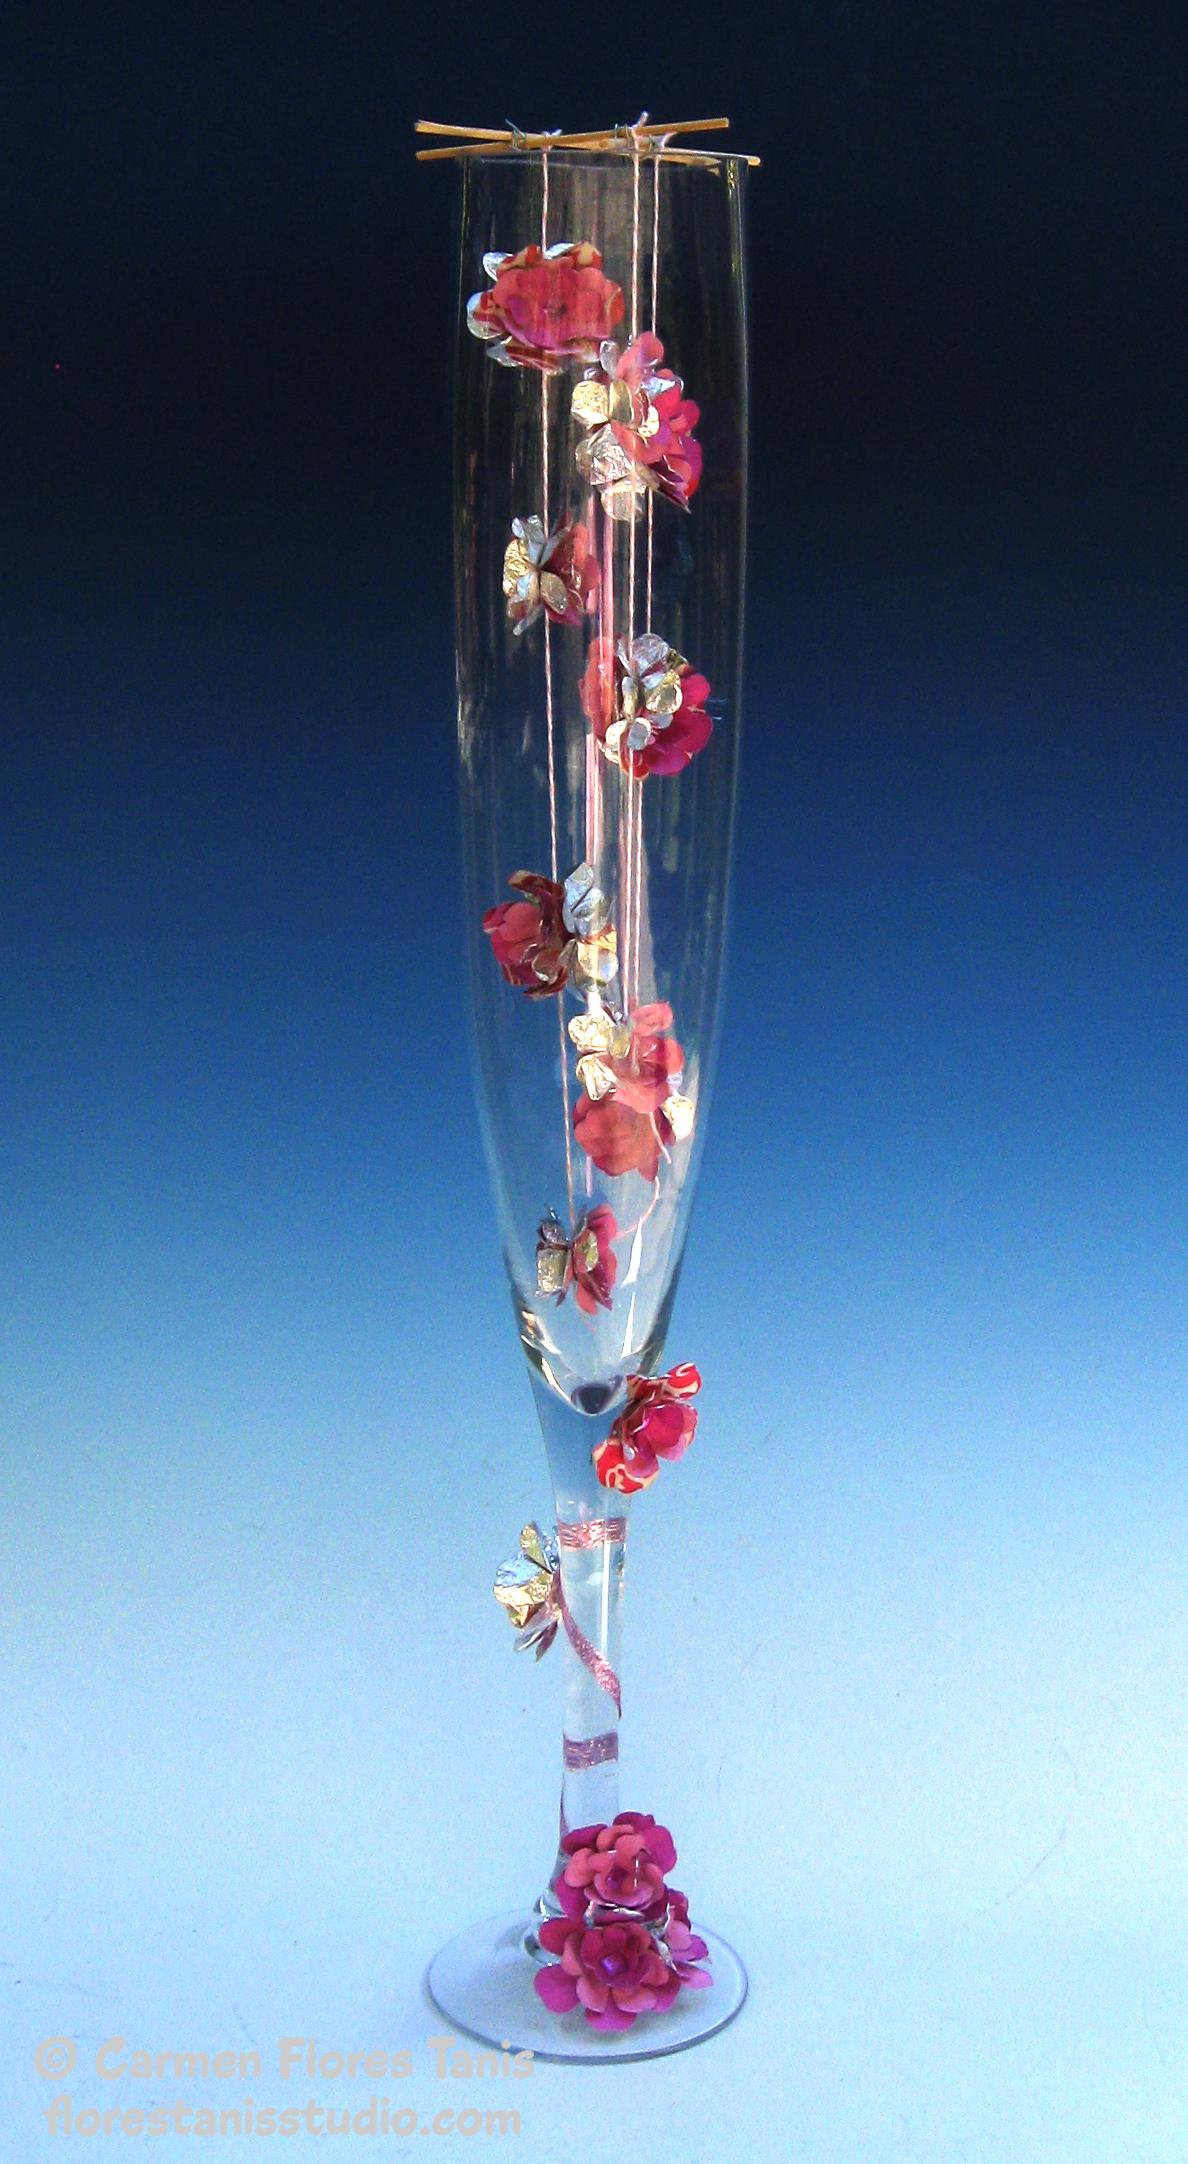 Huge Champagne Glass Centerpiece : Table decor flower blossom champagne flute centerpiece